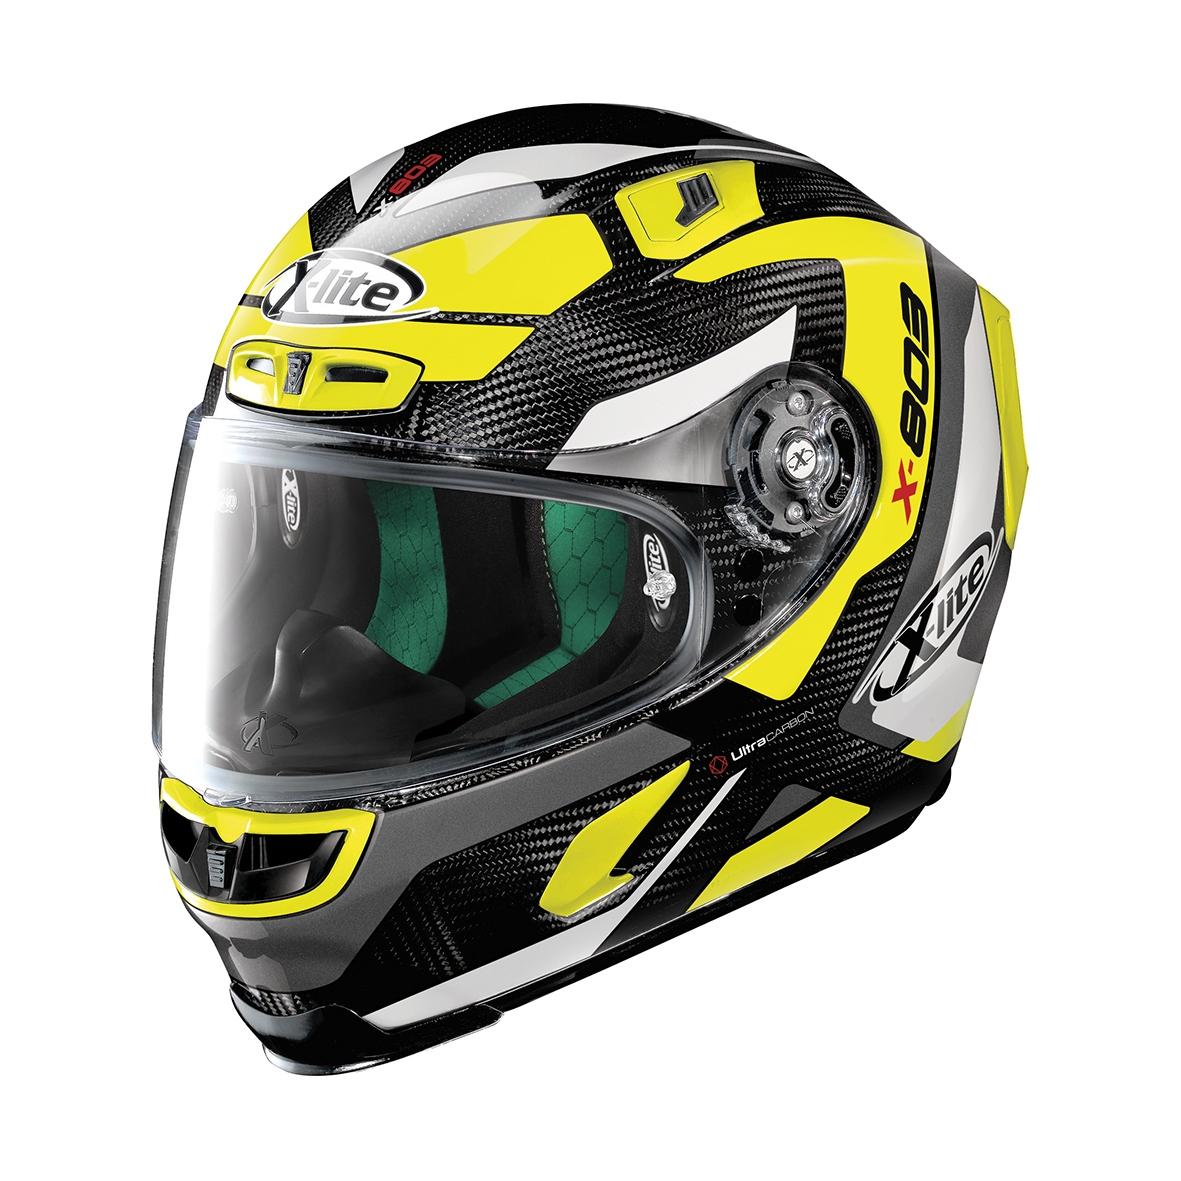 Moto helma X-Lite X-803 Ultra Carbon Mastery Carbon 43